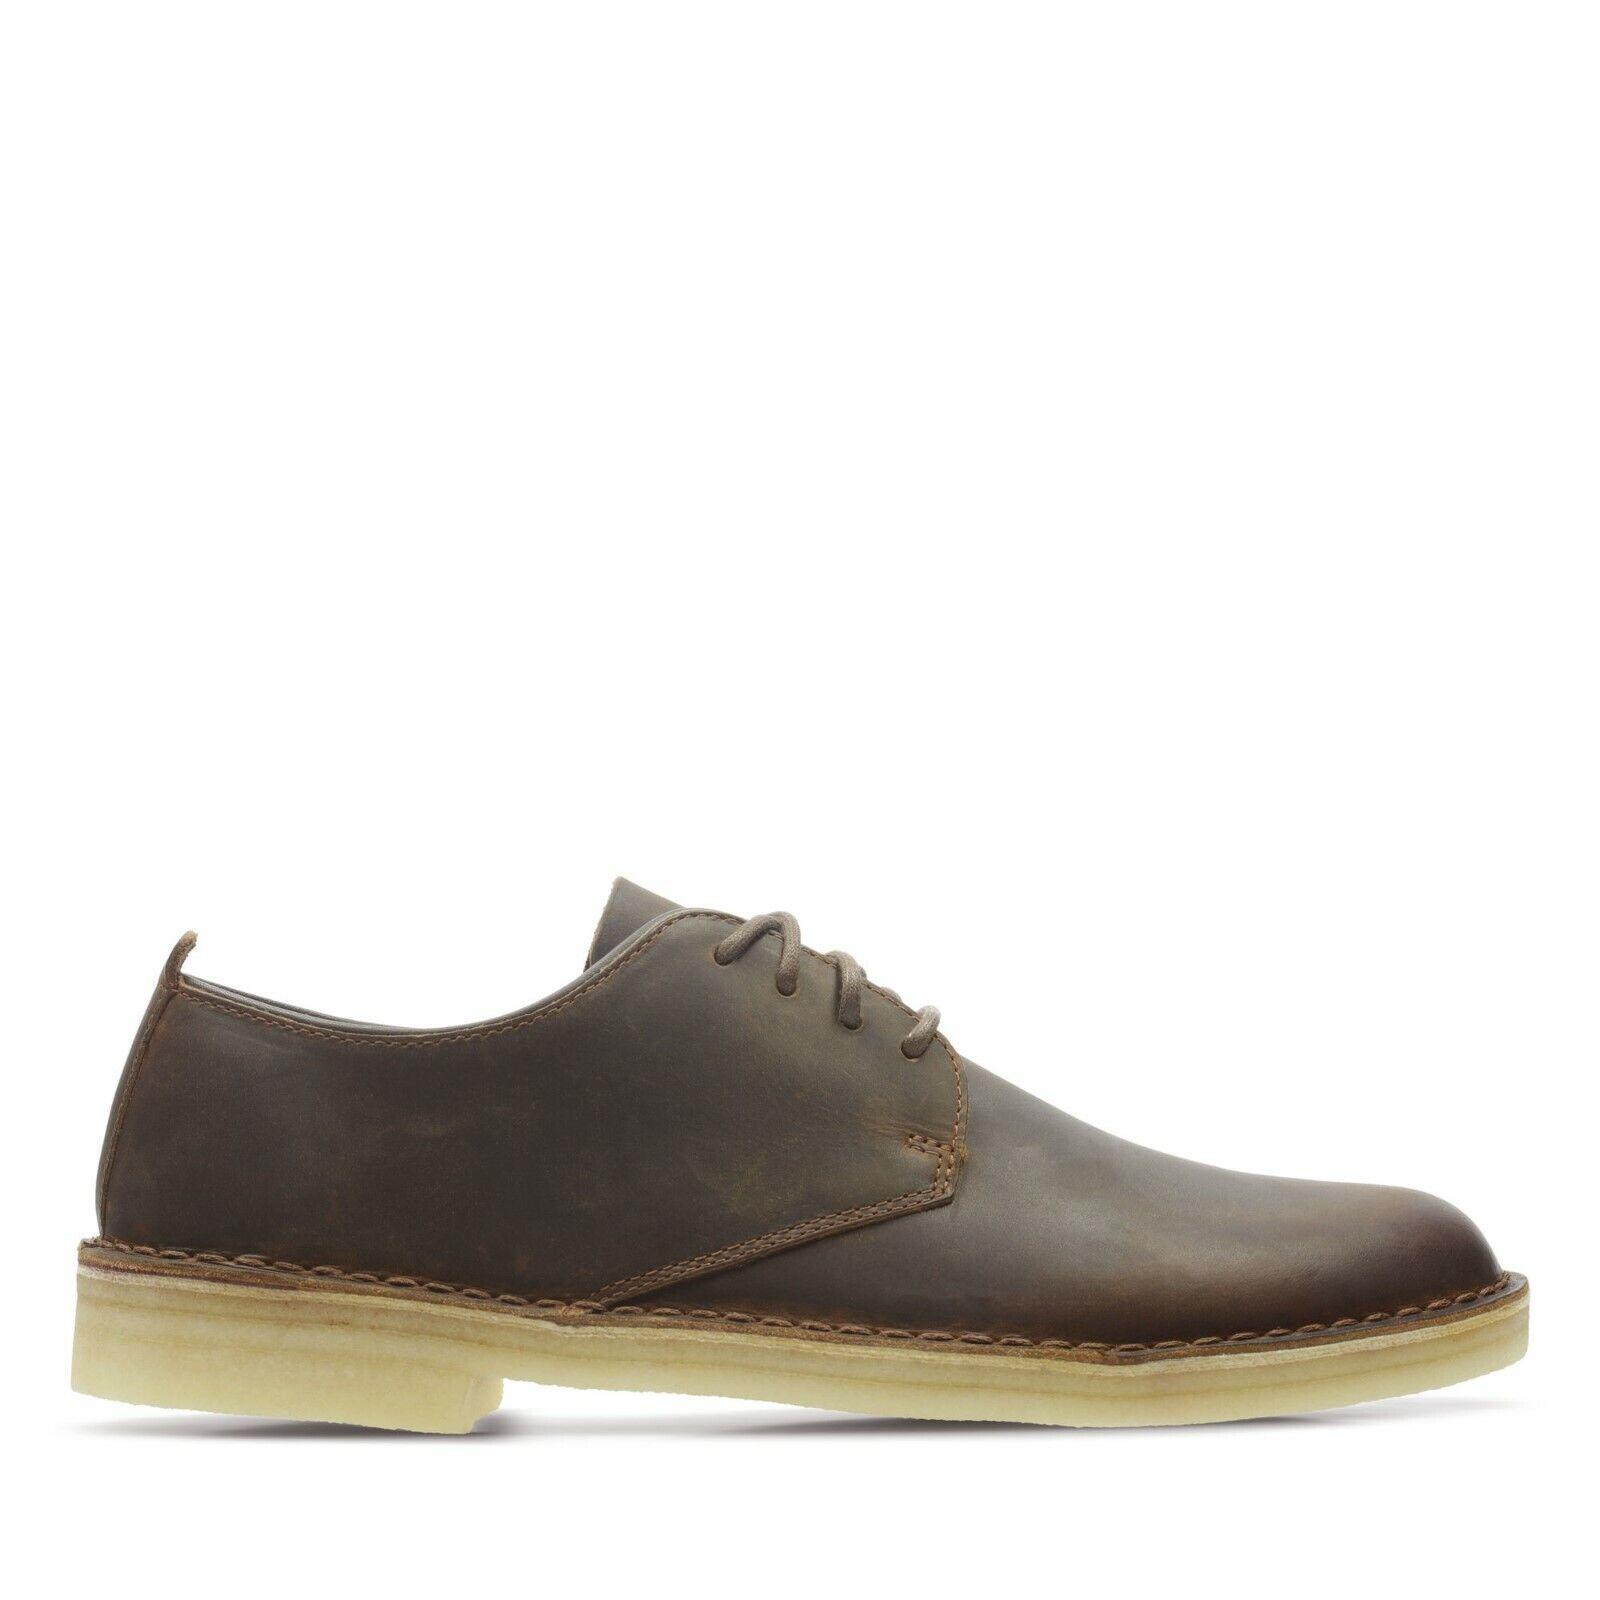 Clarks ORIGINALS Men's DESERT LONDON in Beeswax Leather - Size 9 UK / Braned New